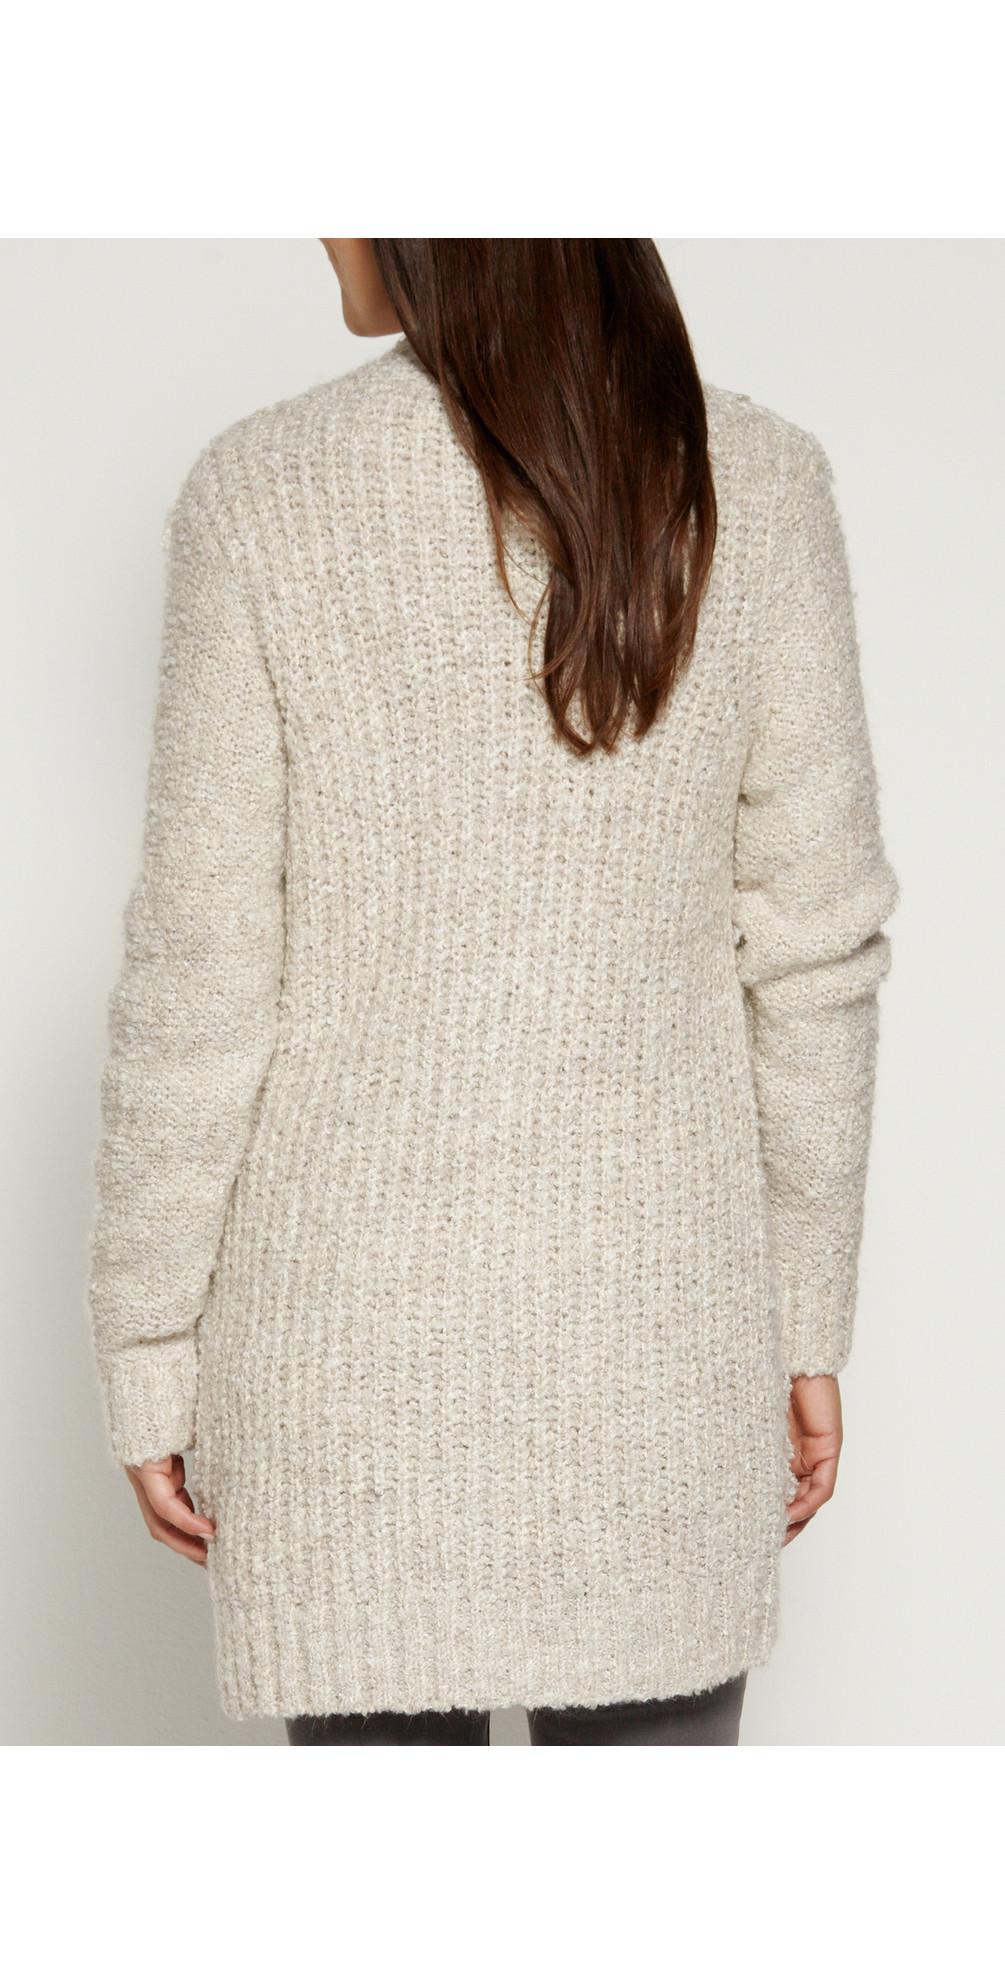 Wool Boucle Cardigan main image